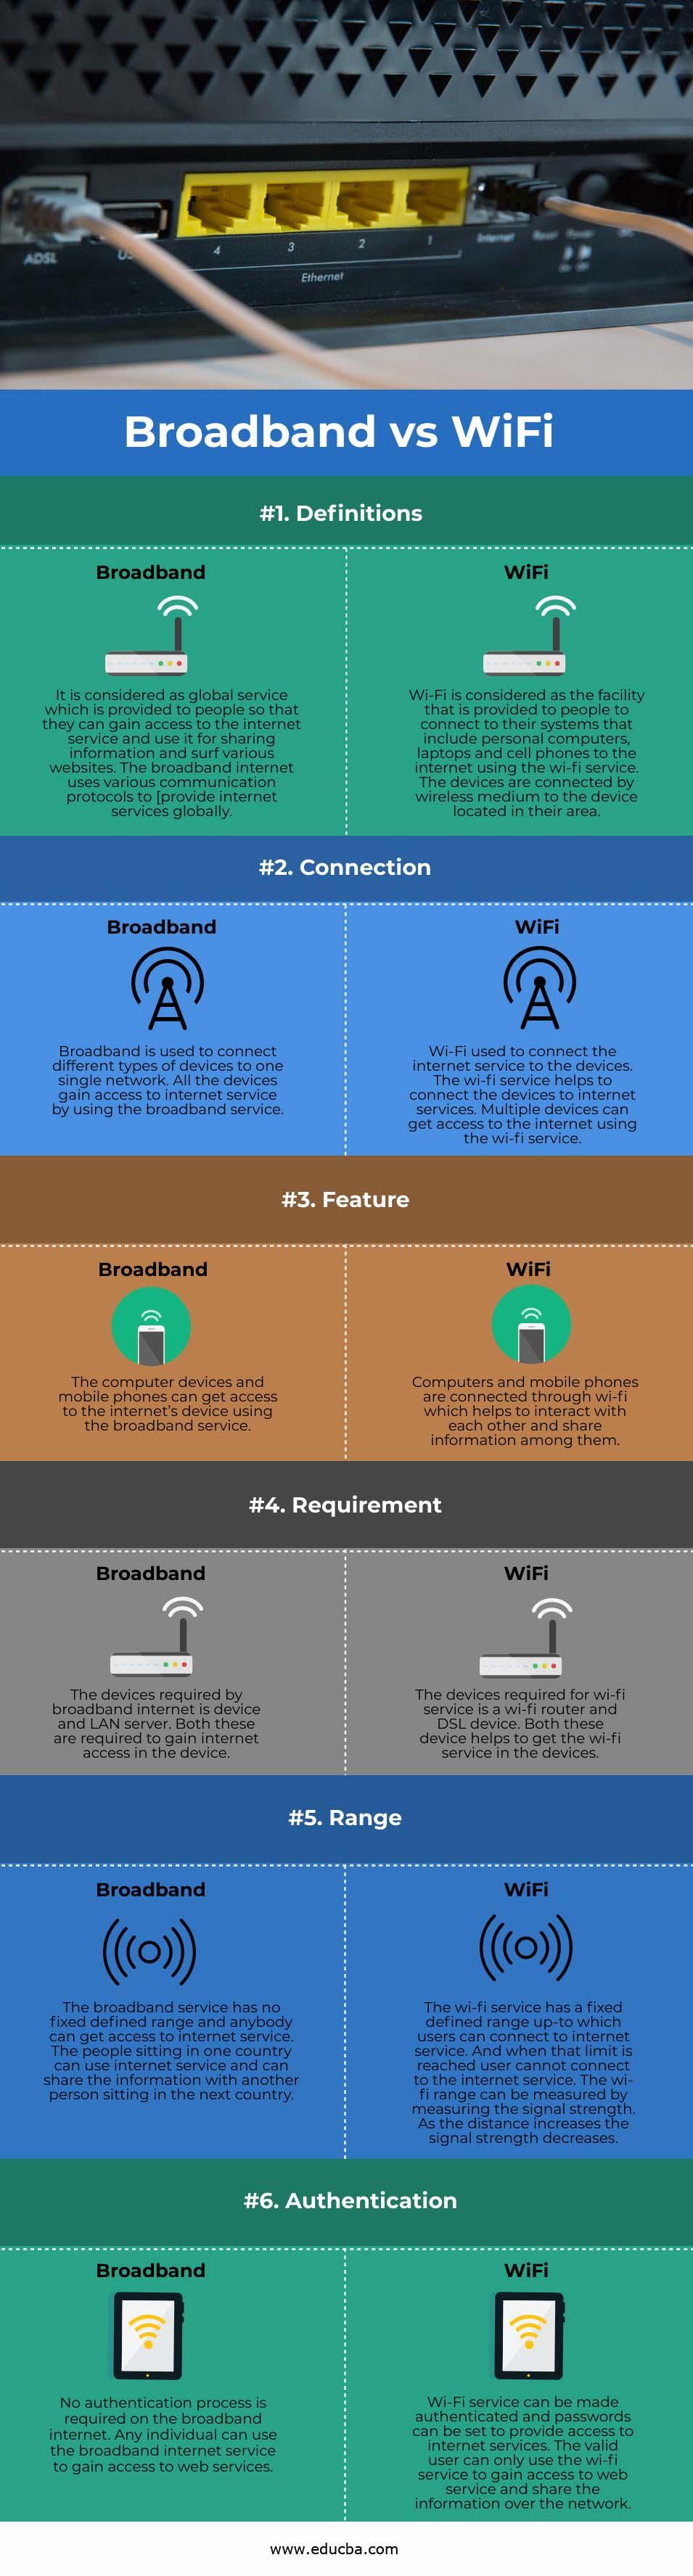 Broadband vsWiFi info